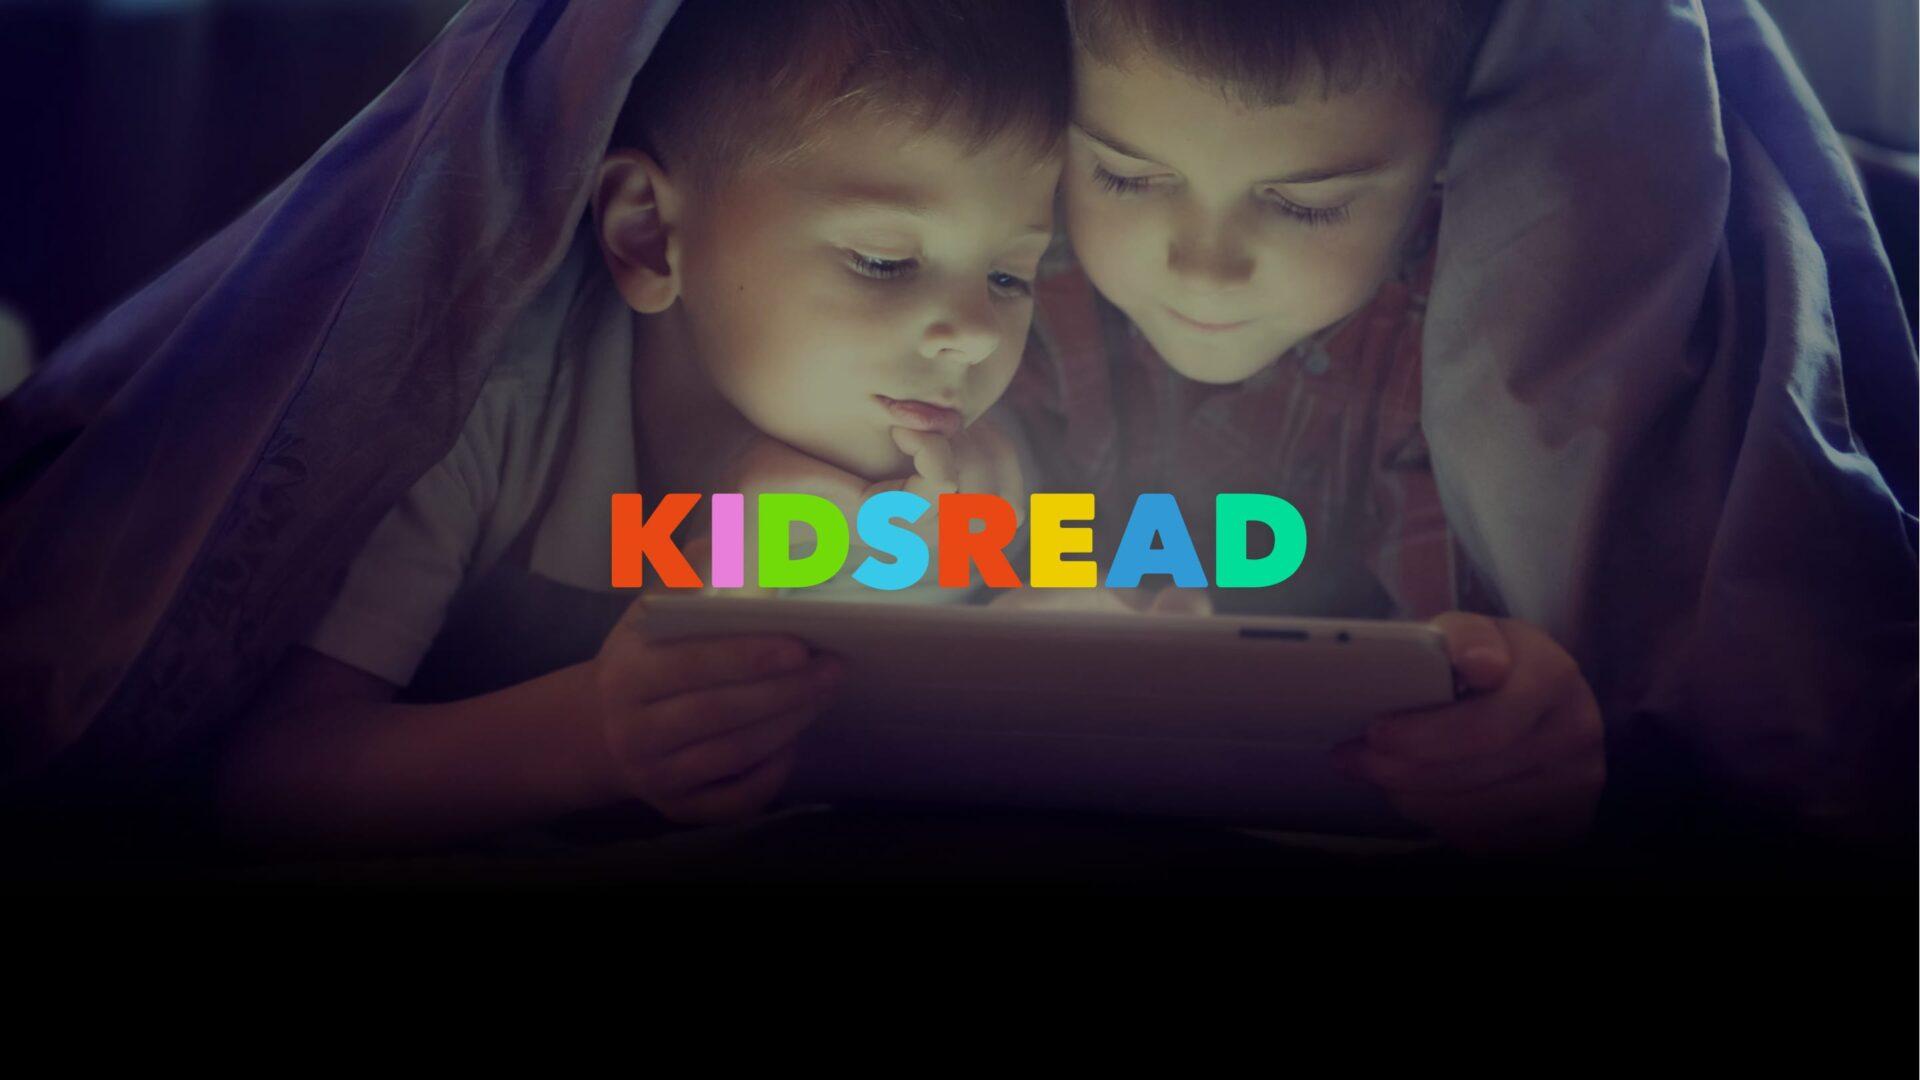 Kidsread